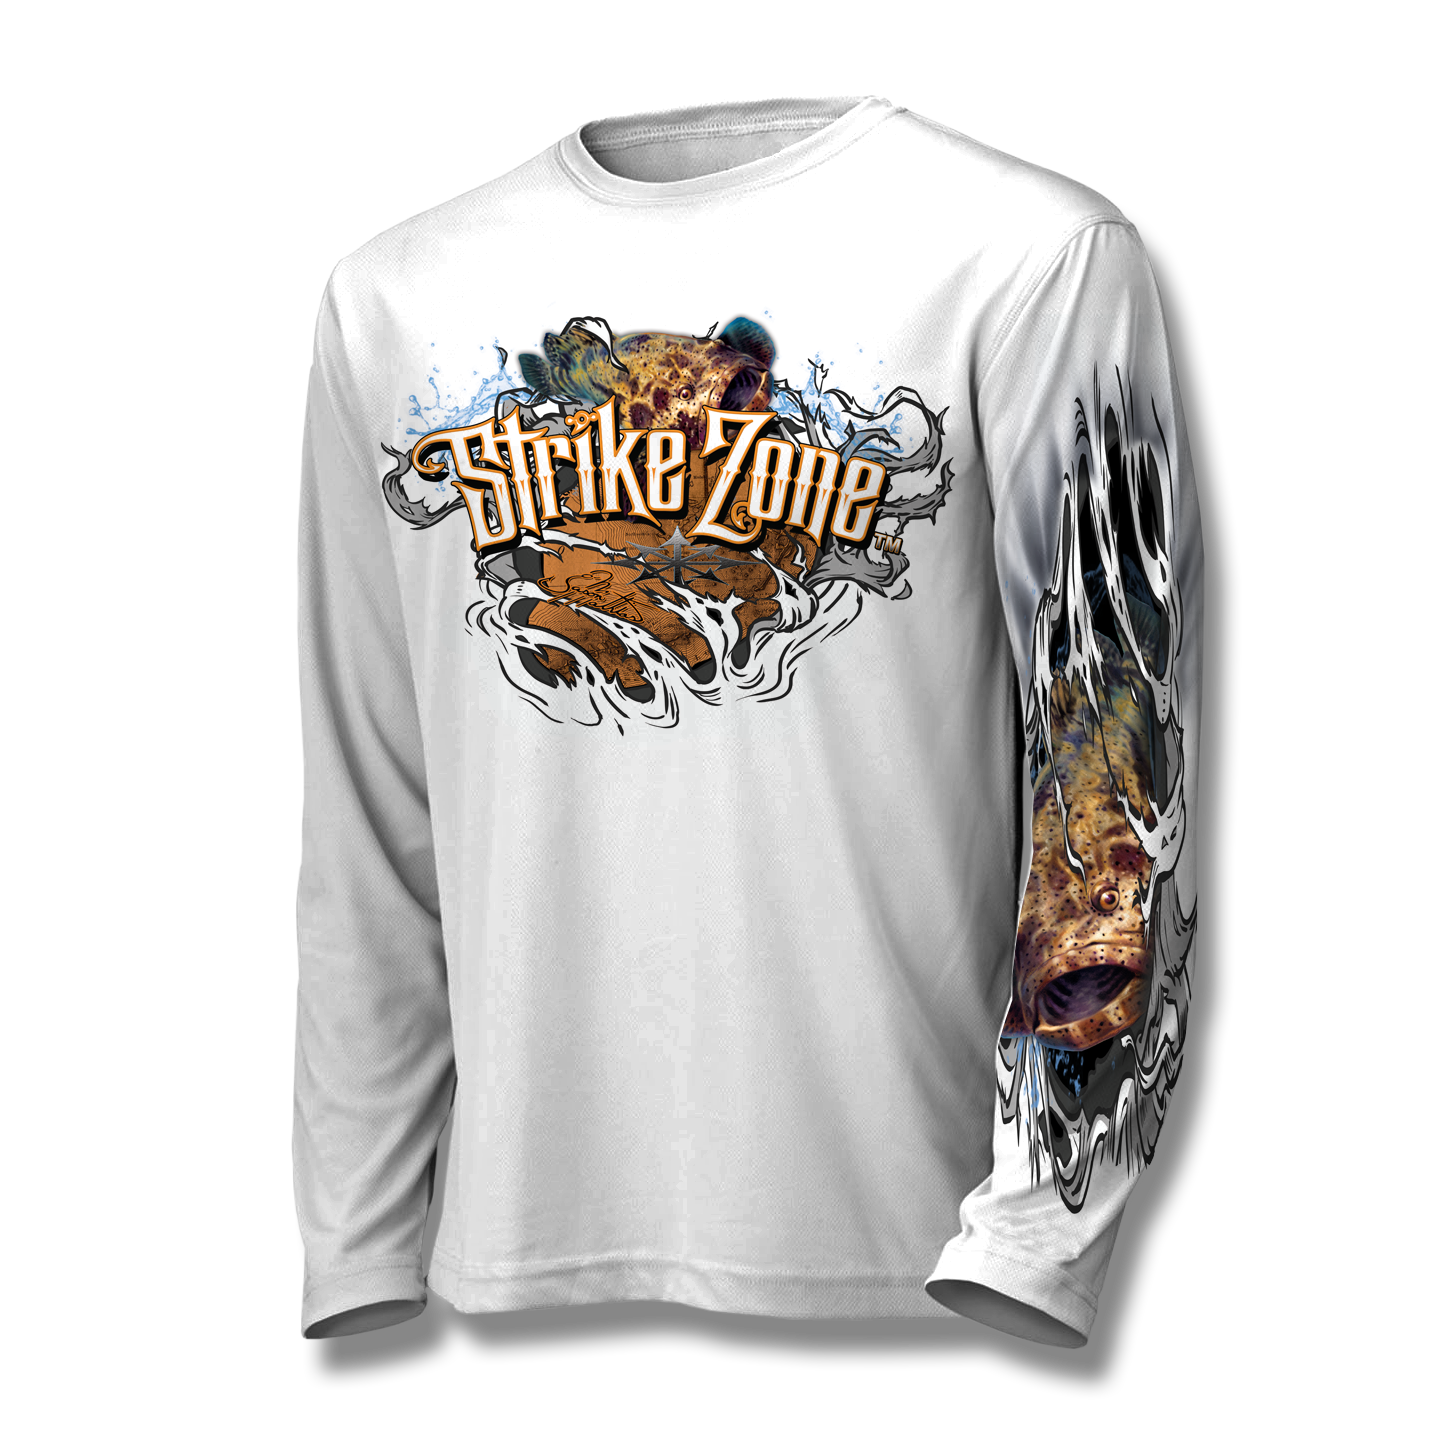 jason-mathias-strike-zone-white-white-grouper-fishing-shirt.png